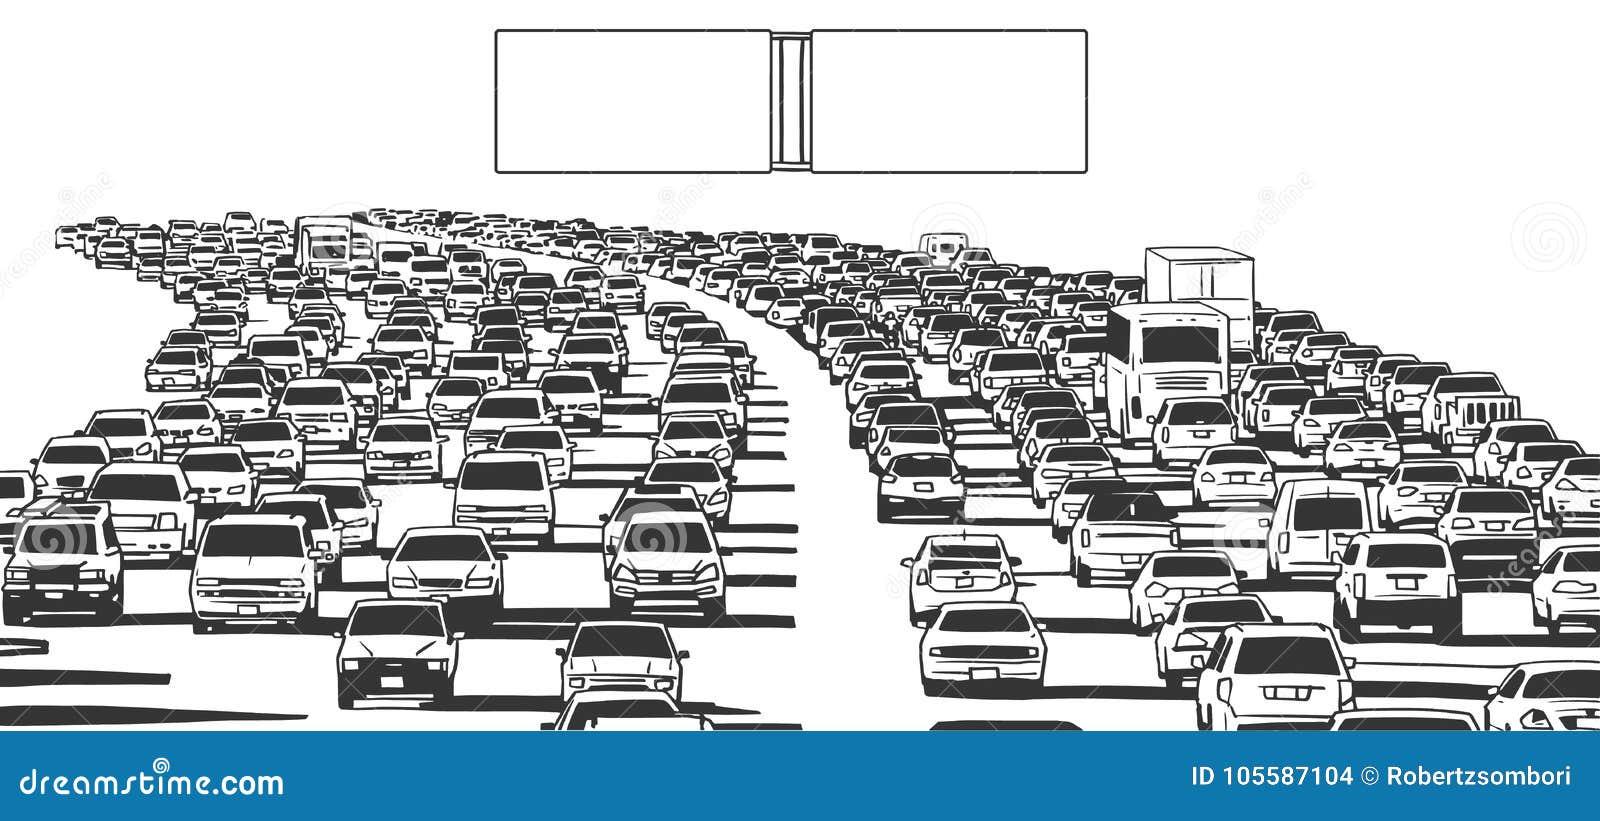 Illustration Of Rush Hour Traffic Jam On Freeway Stock Illustration ...